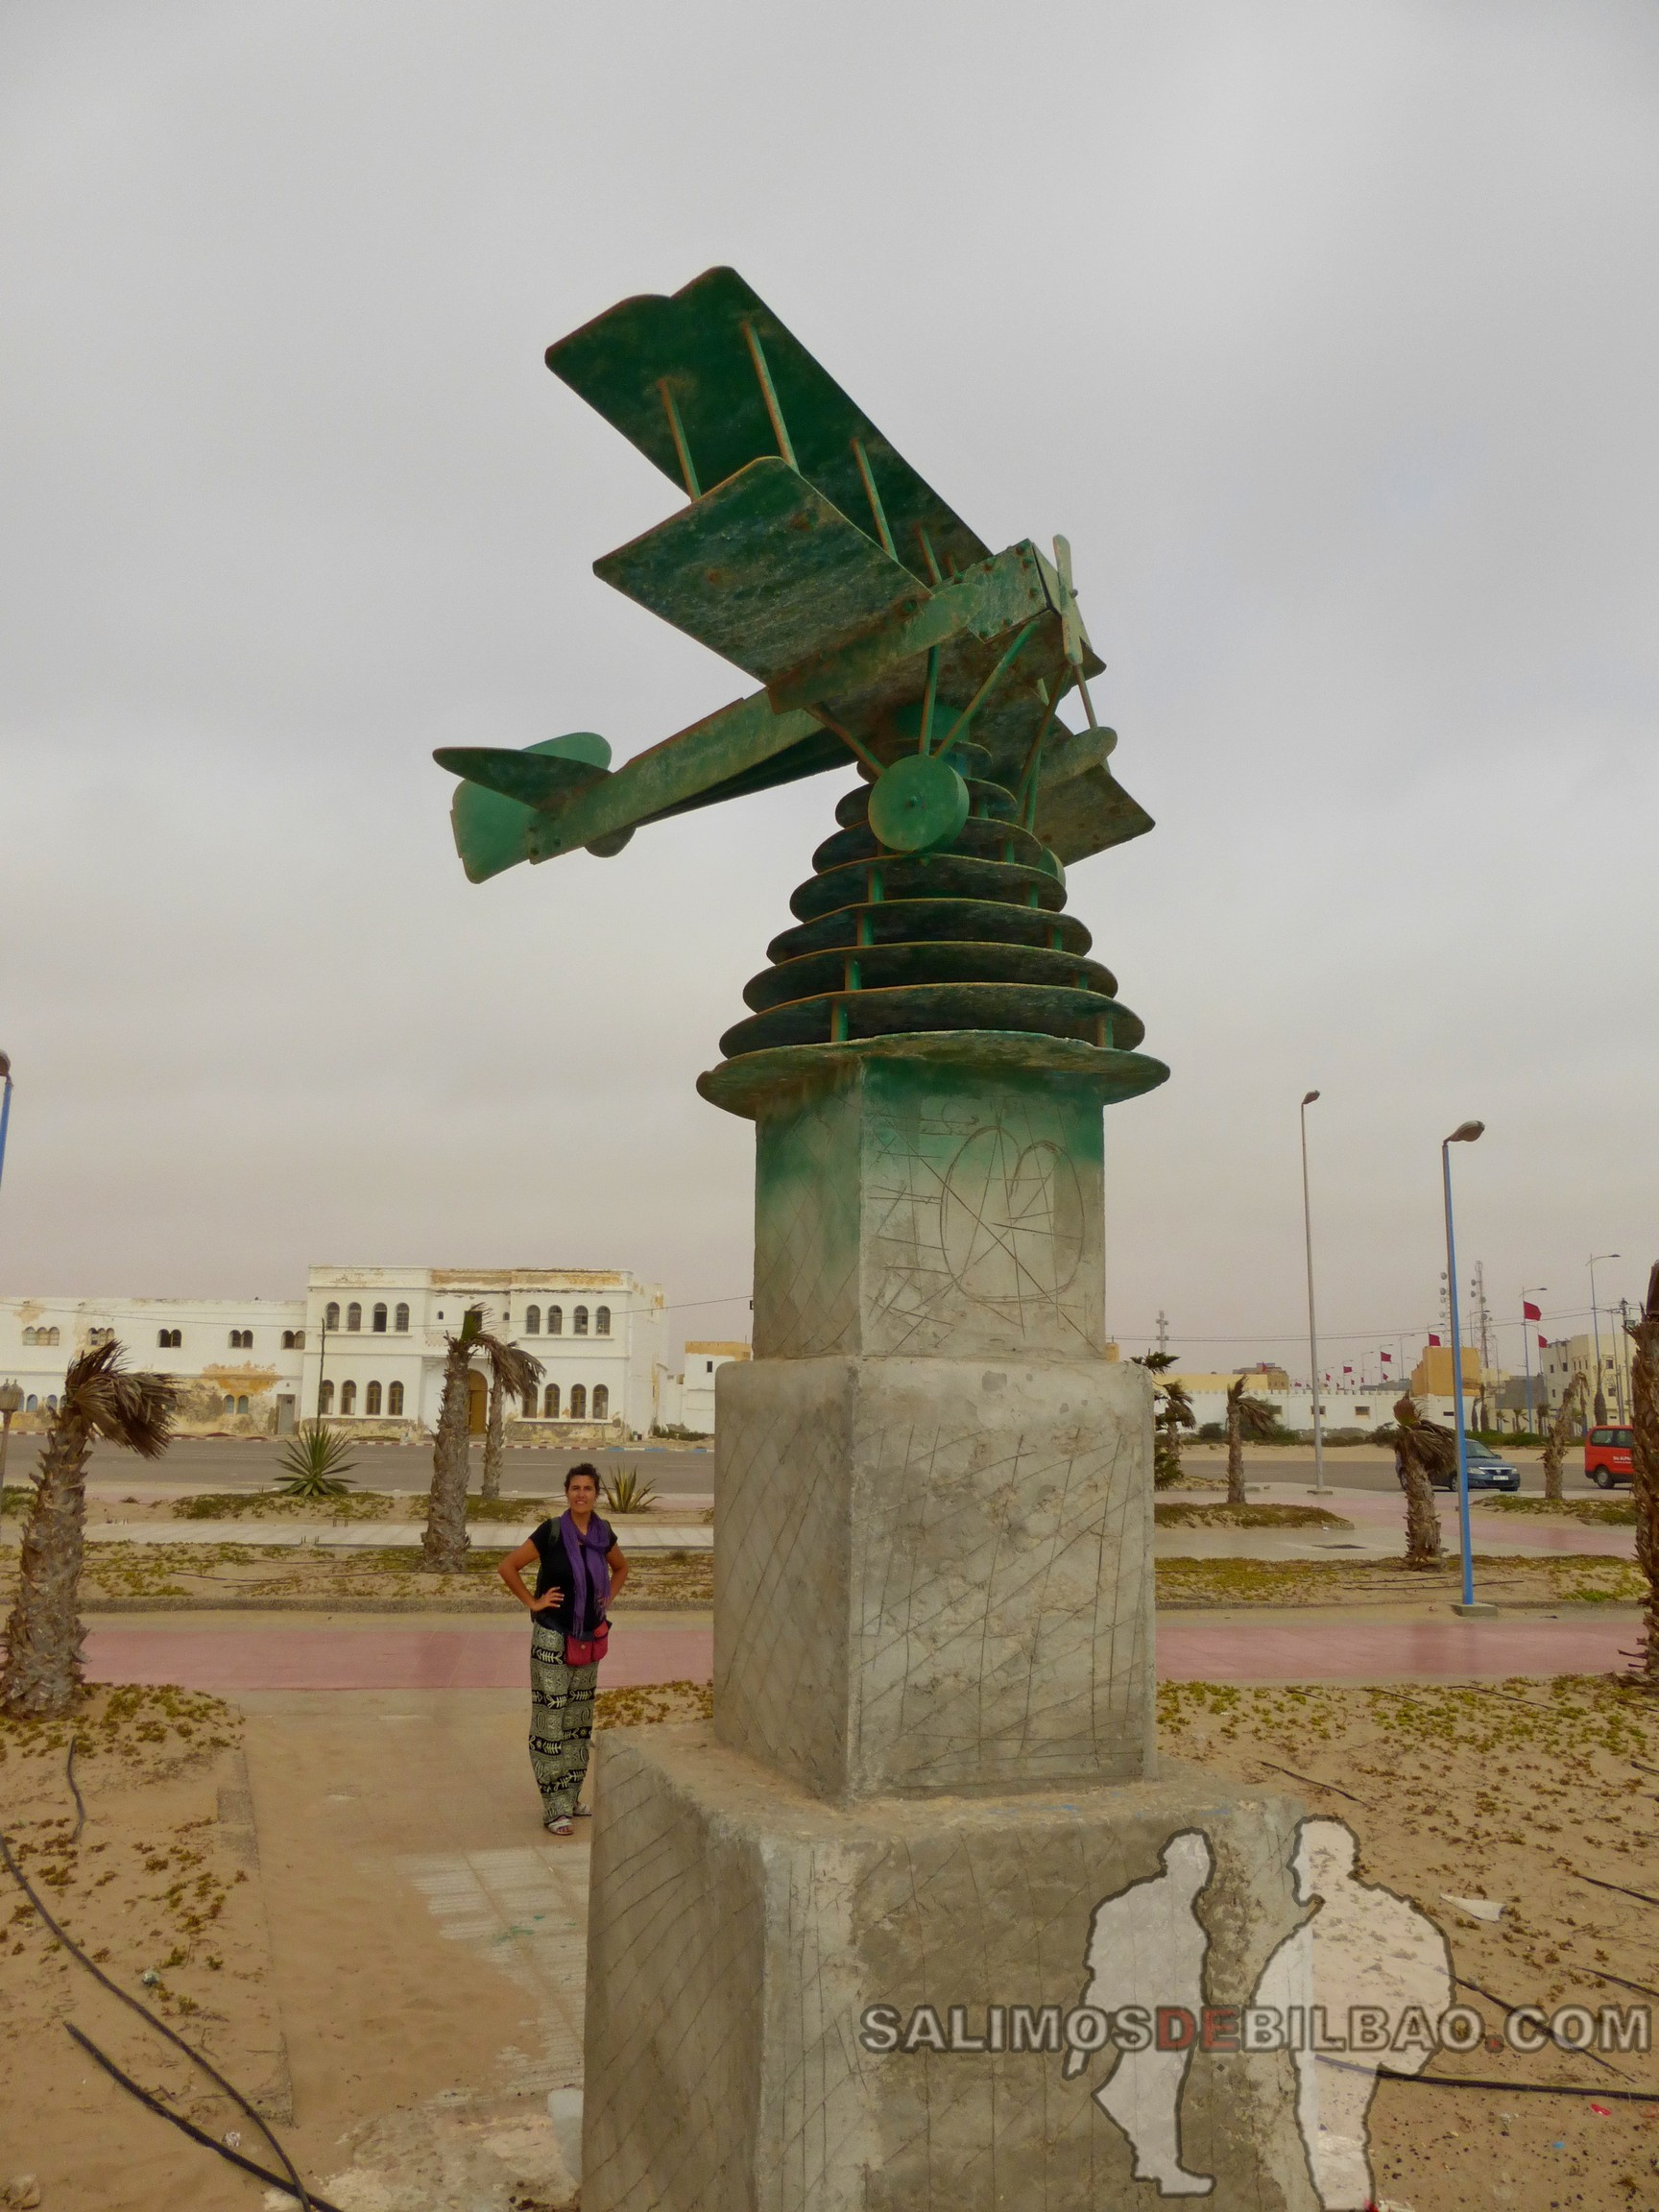 291. Monumento a Saint Exupery, Tarfaya